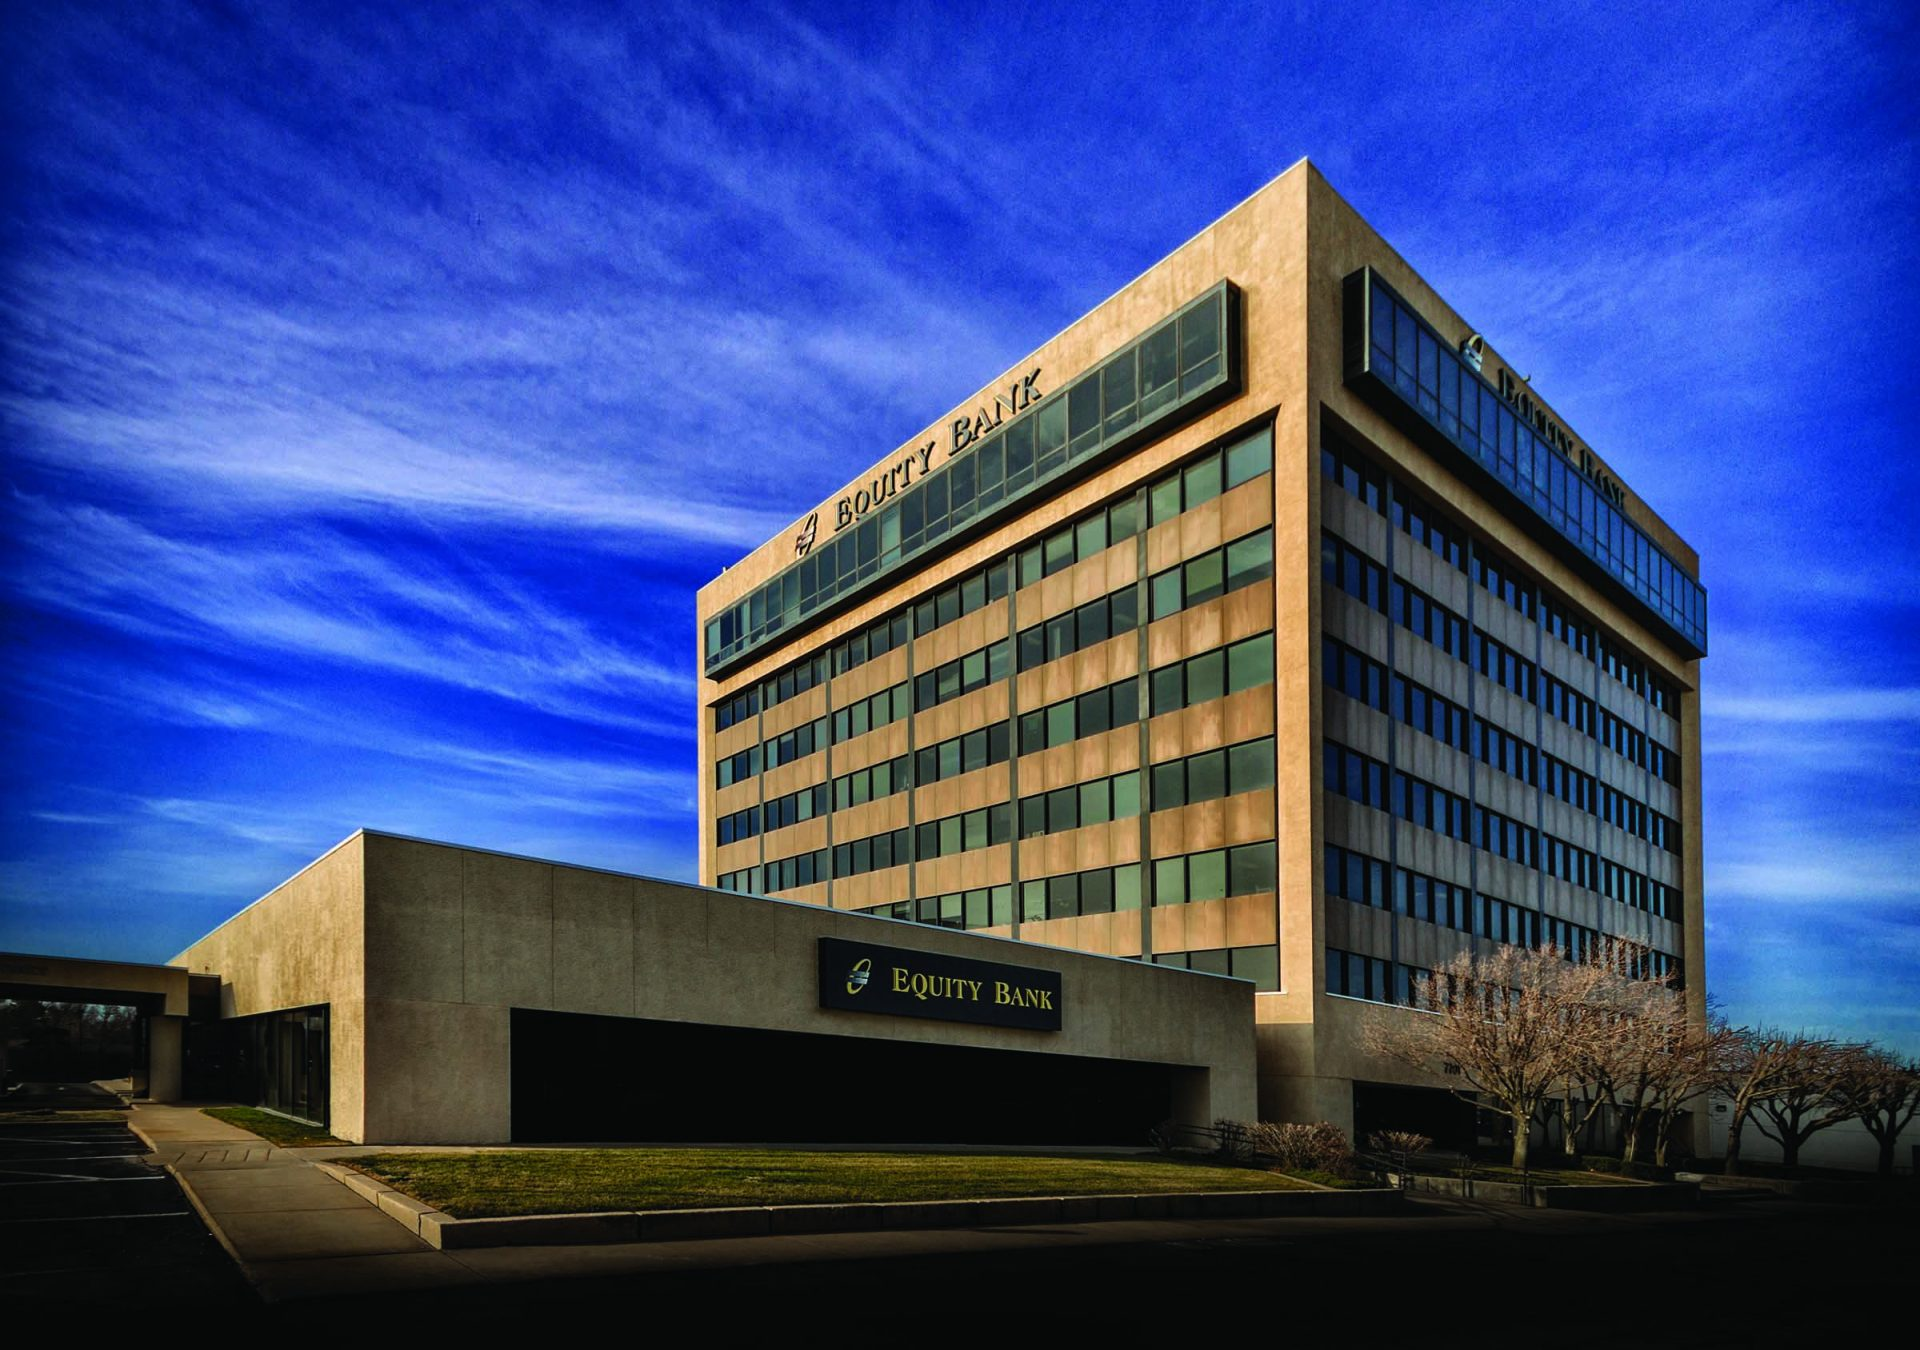 Equity Bank Wichita Rock Road branch exterior.